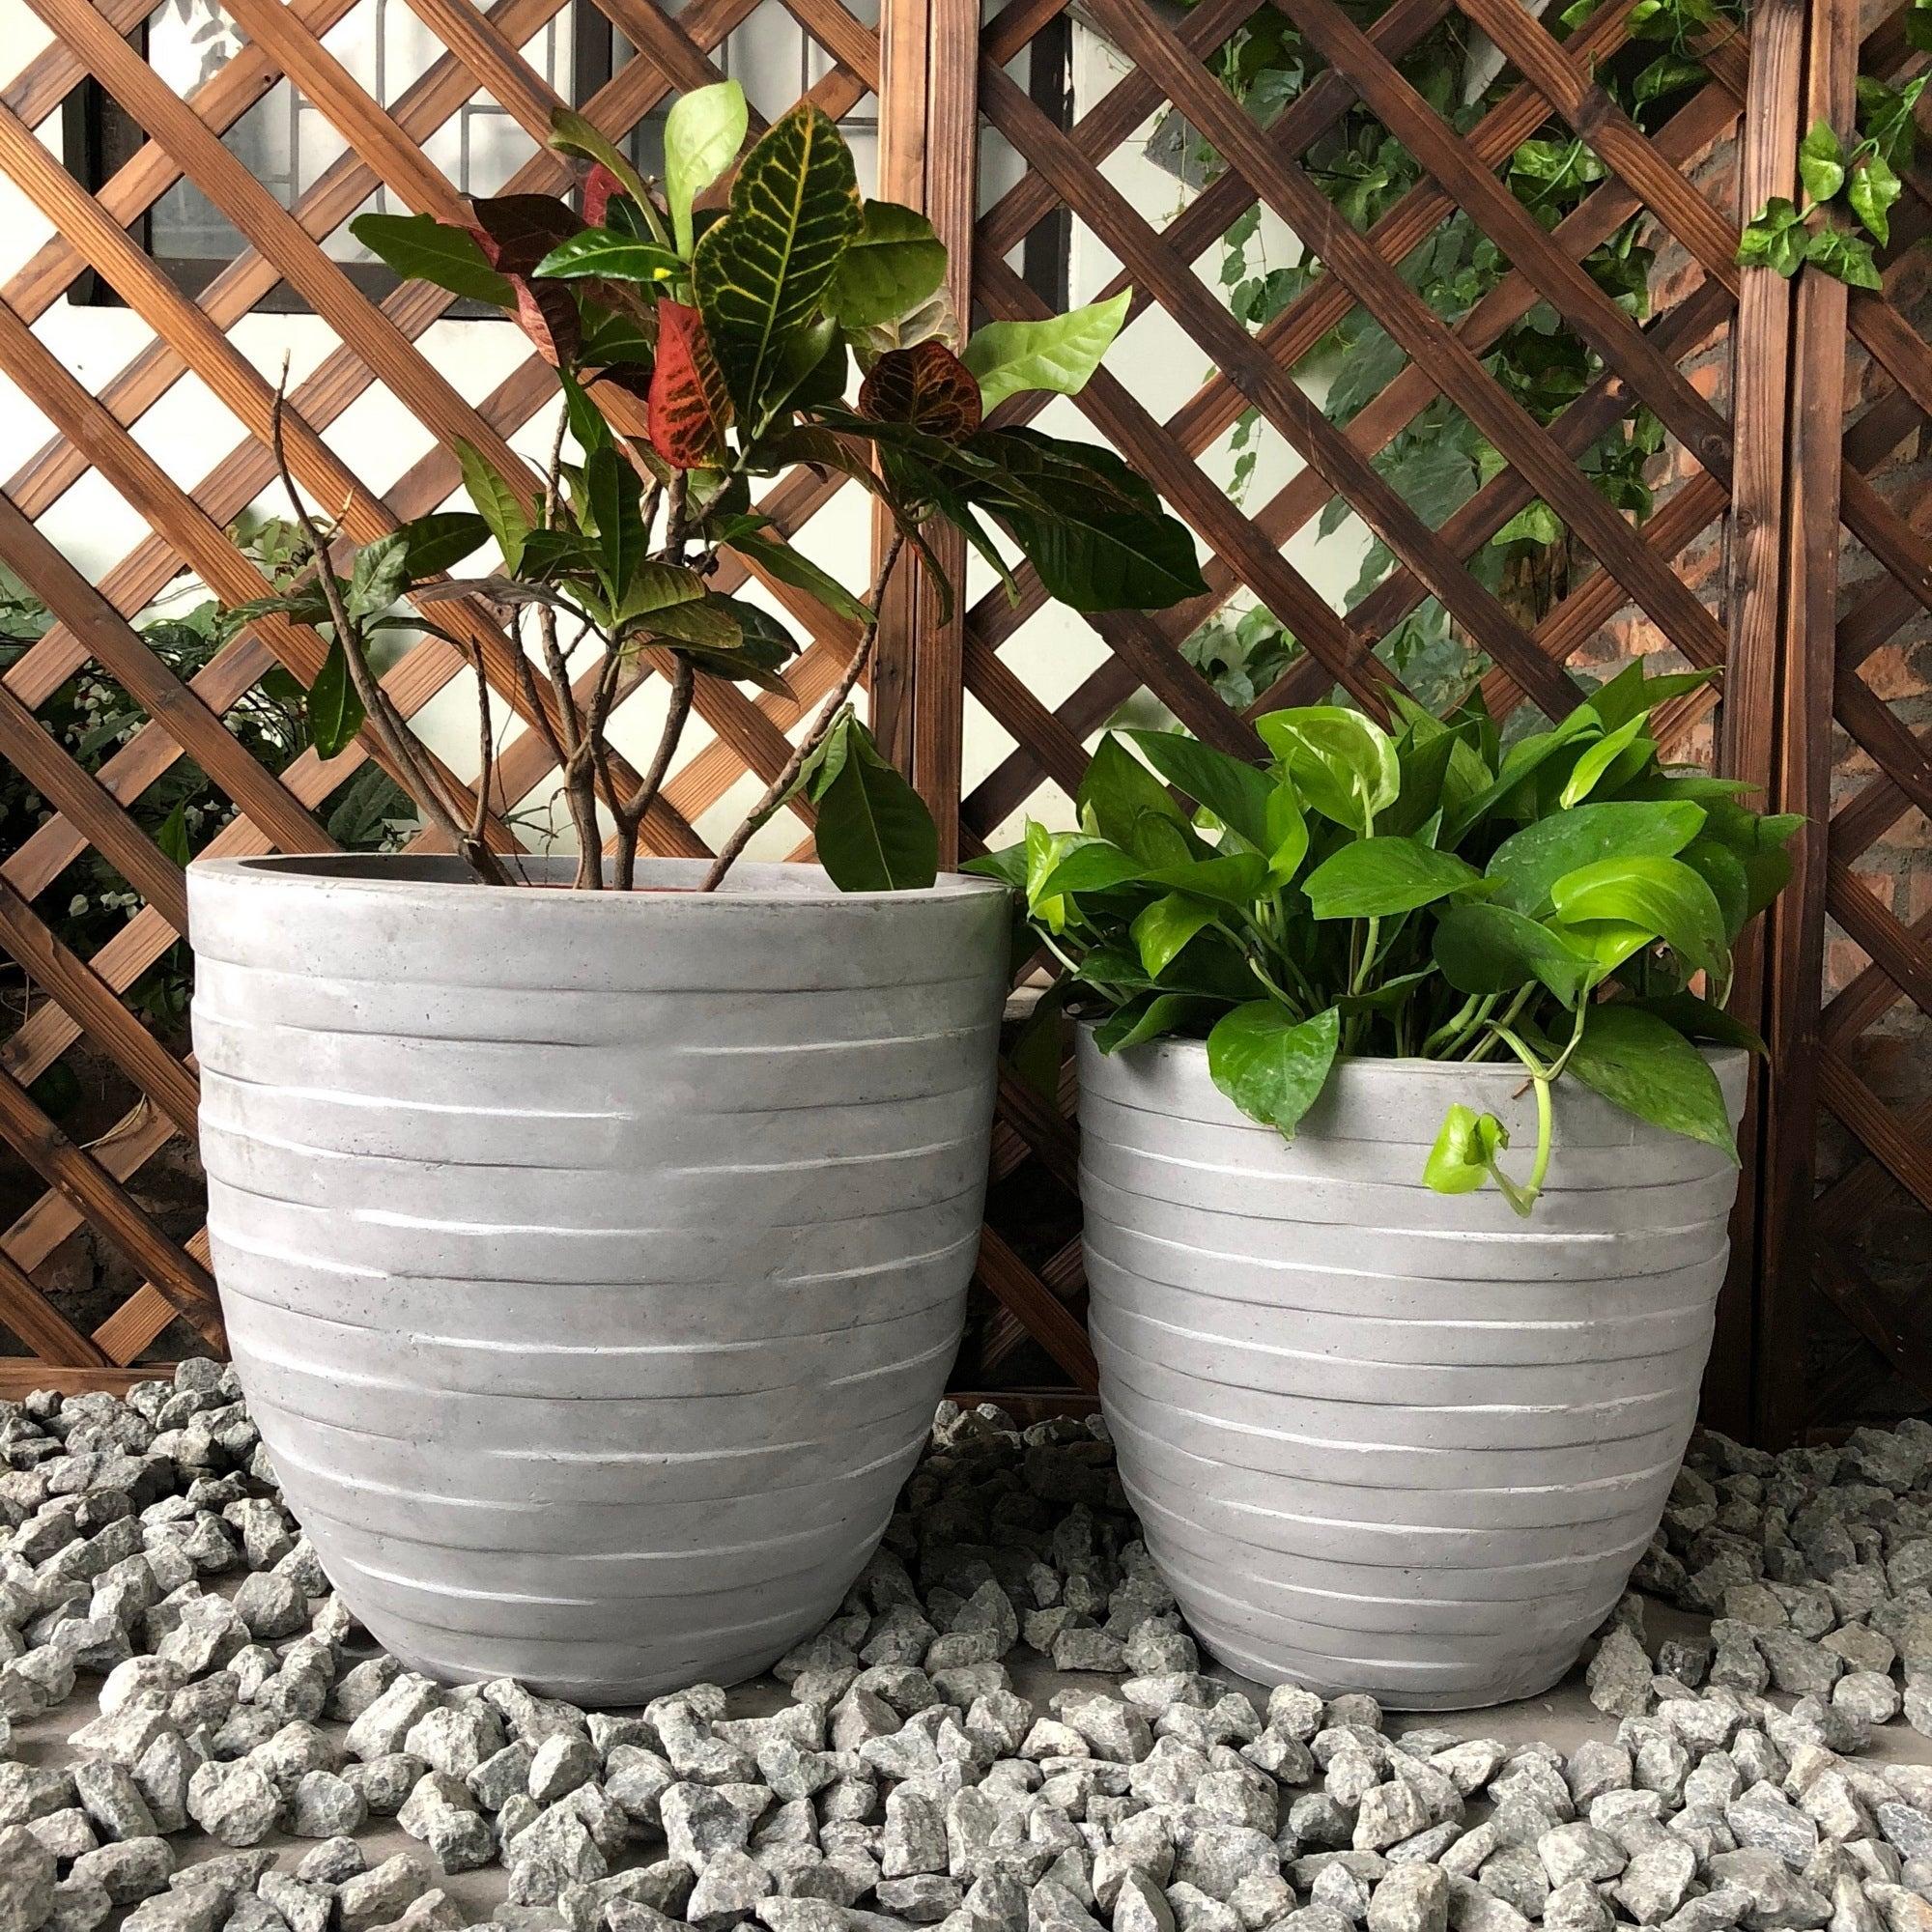 Durx Litecrete Lightweight Concrete Wicker Basket Weave Round Light Grey Planter Set Of 2 8 X 10 Free Shipping Today 22818370